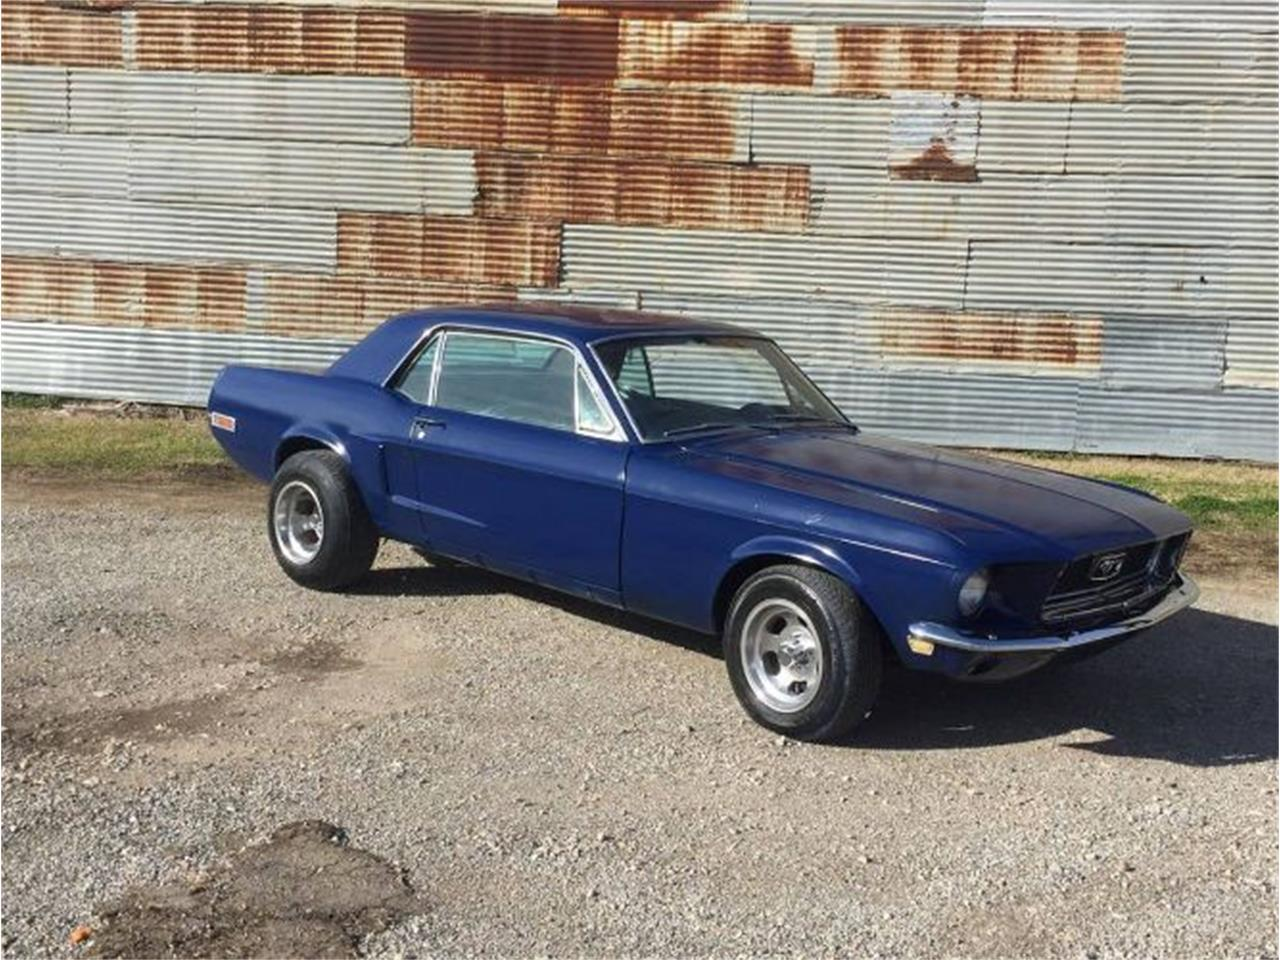 Ford Mustang V8 289 1968 prix tout compris 1968